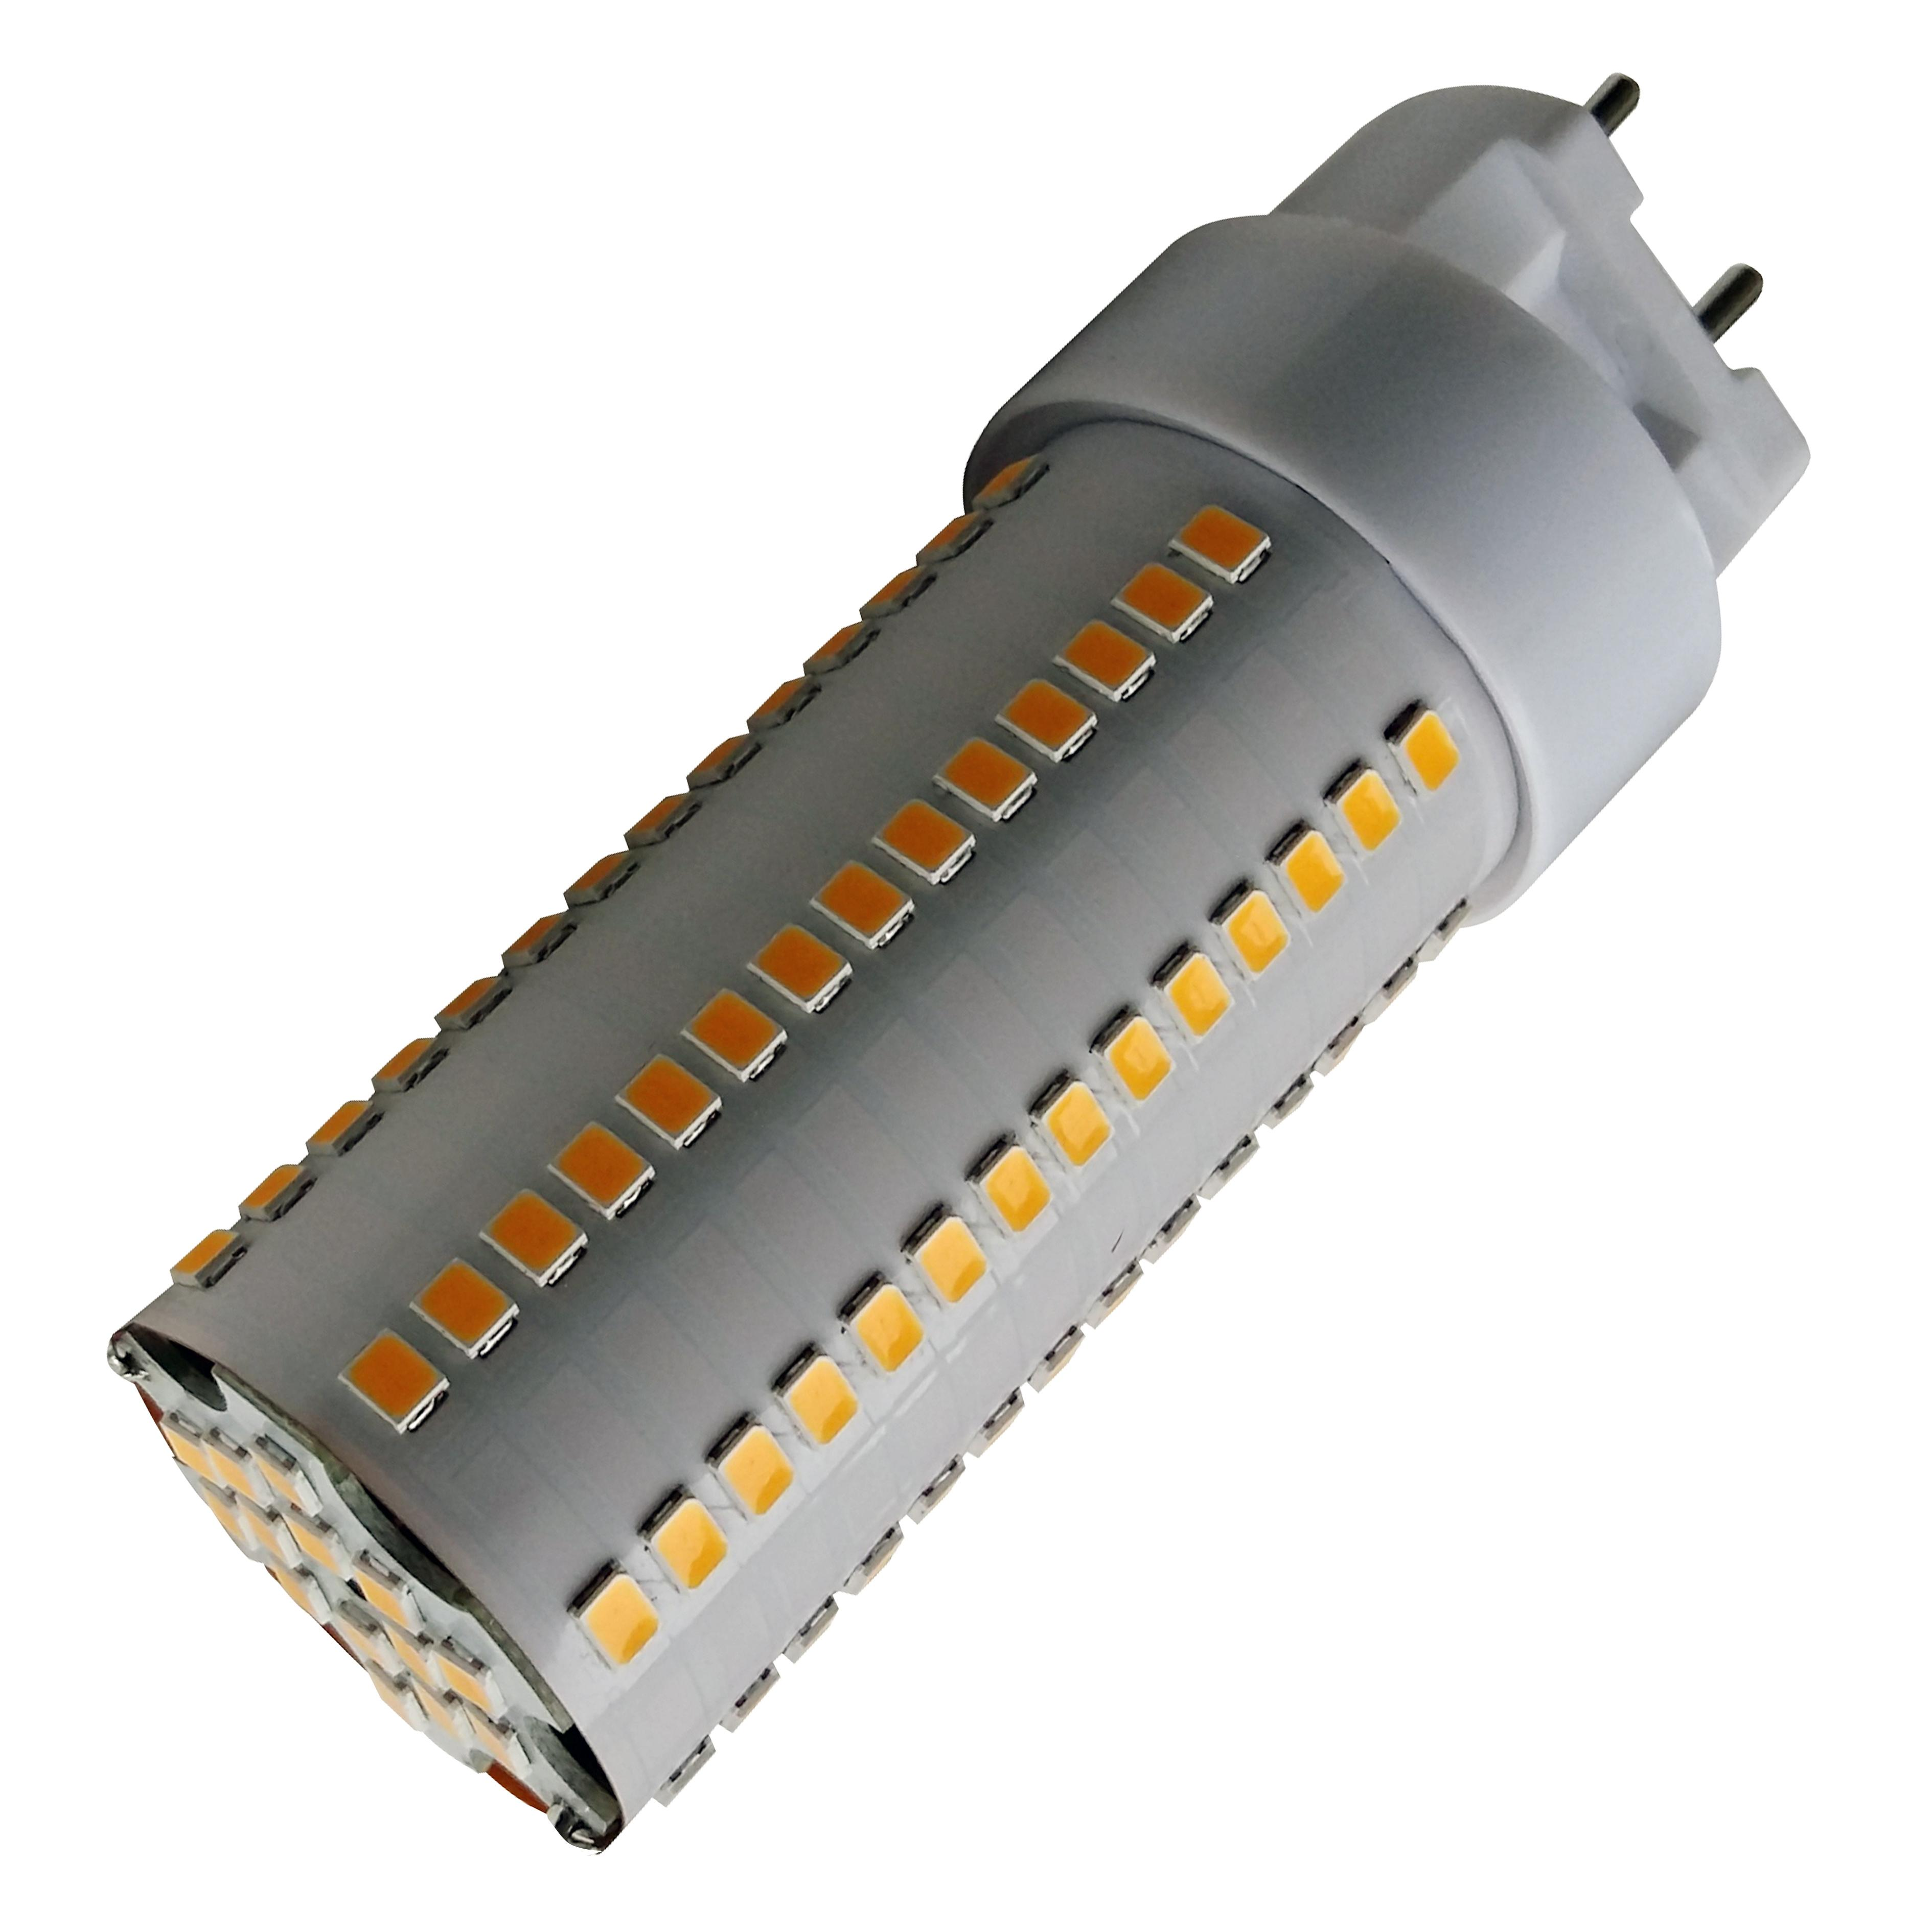 10pcs-lot-20w-g12-led-light-2400lm-led-g12 Luxus Led Lampe 3 Watt Dekorationen